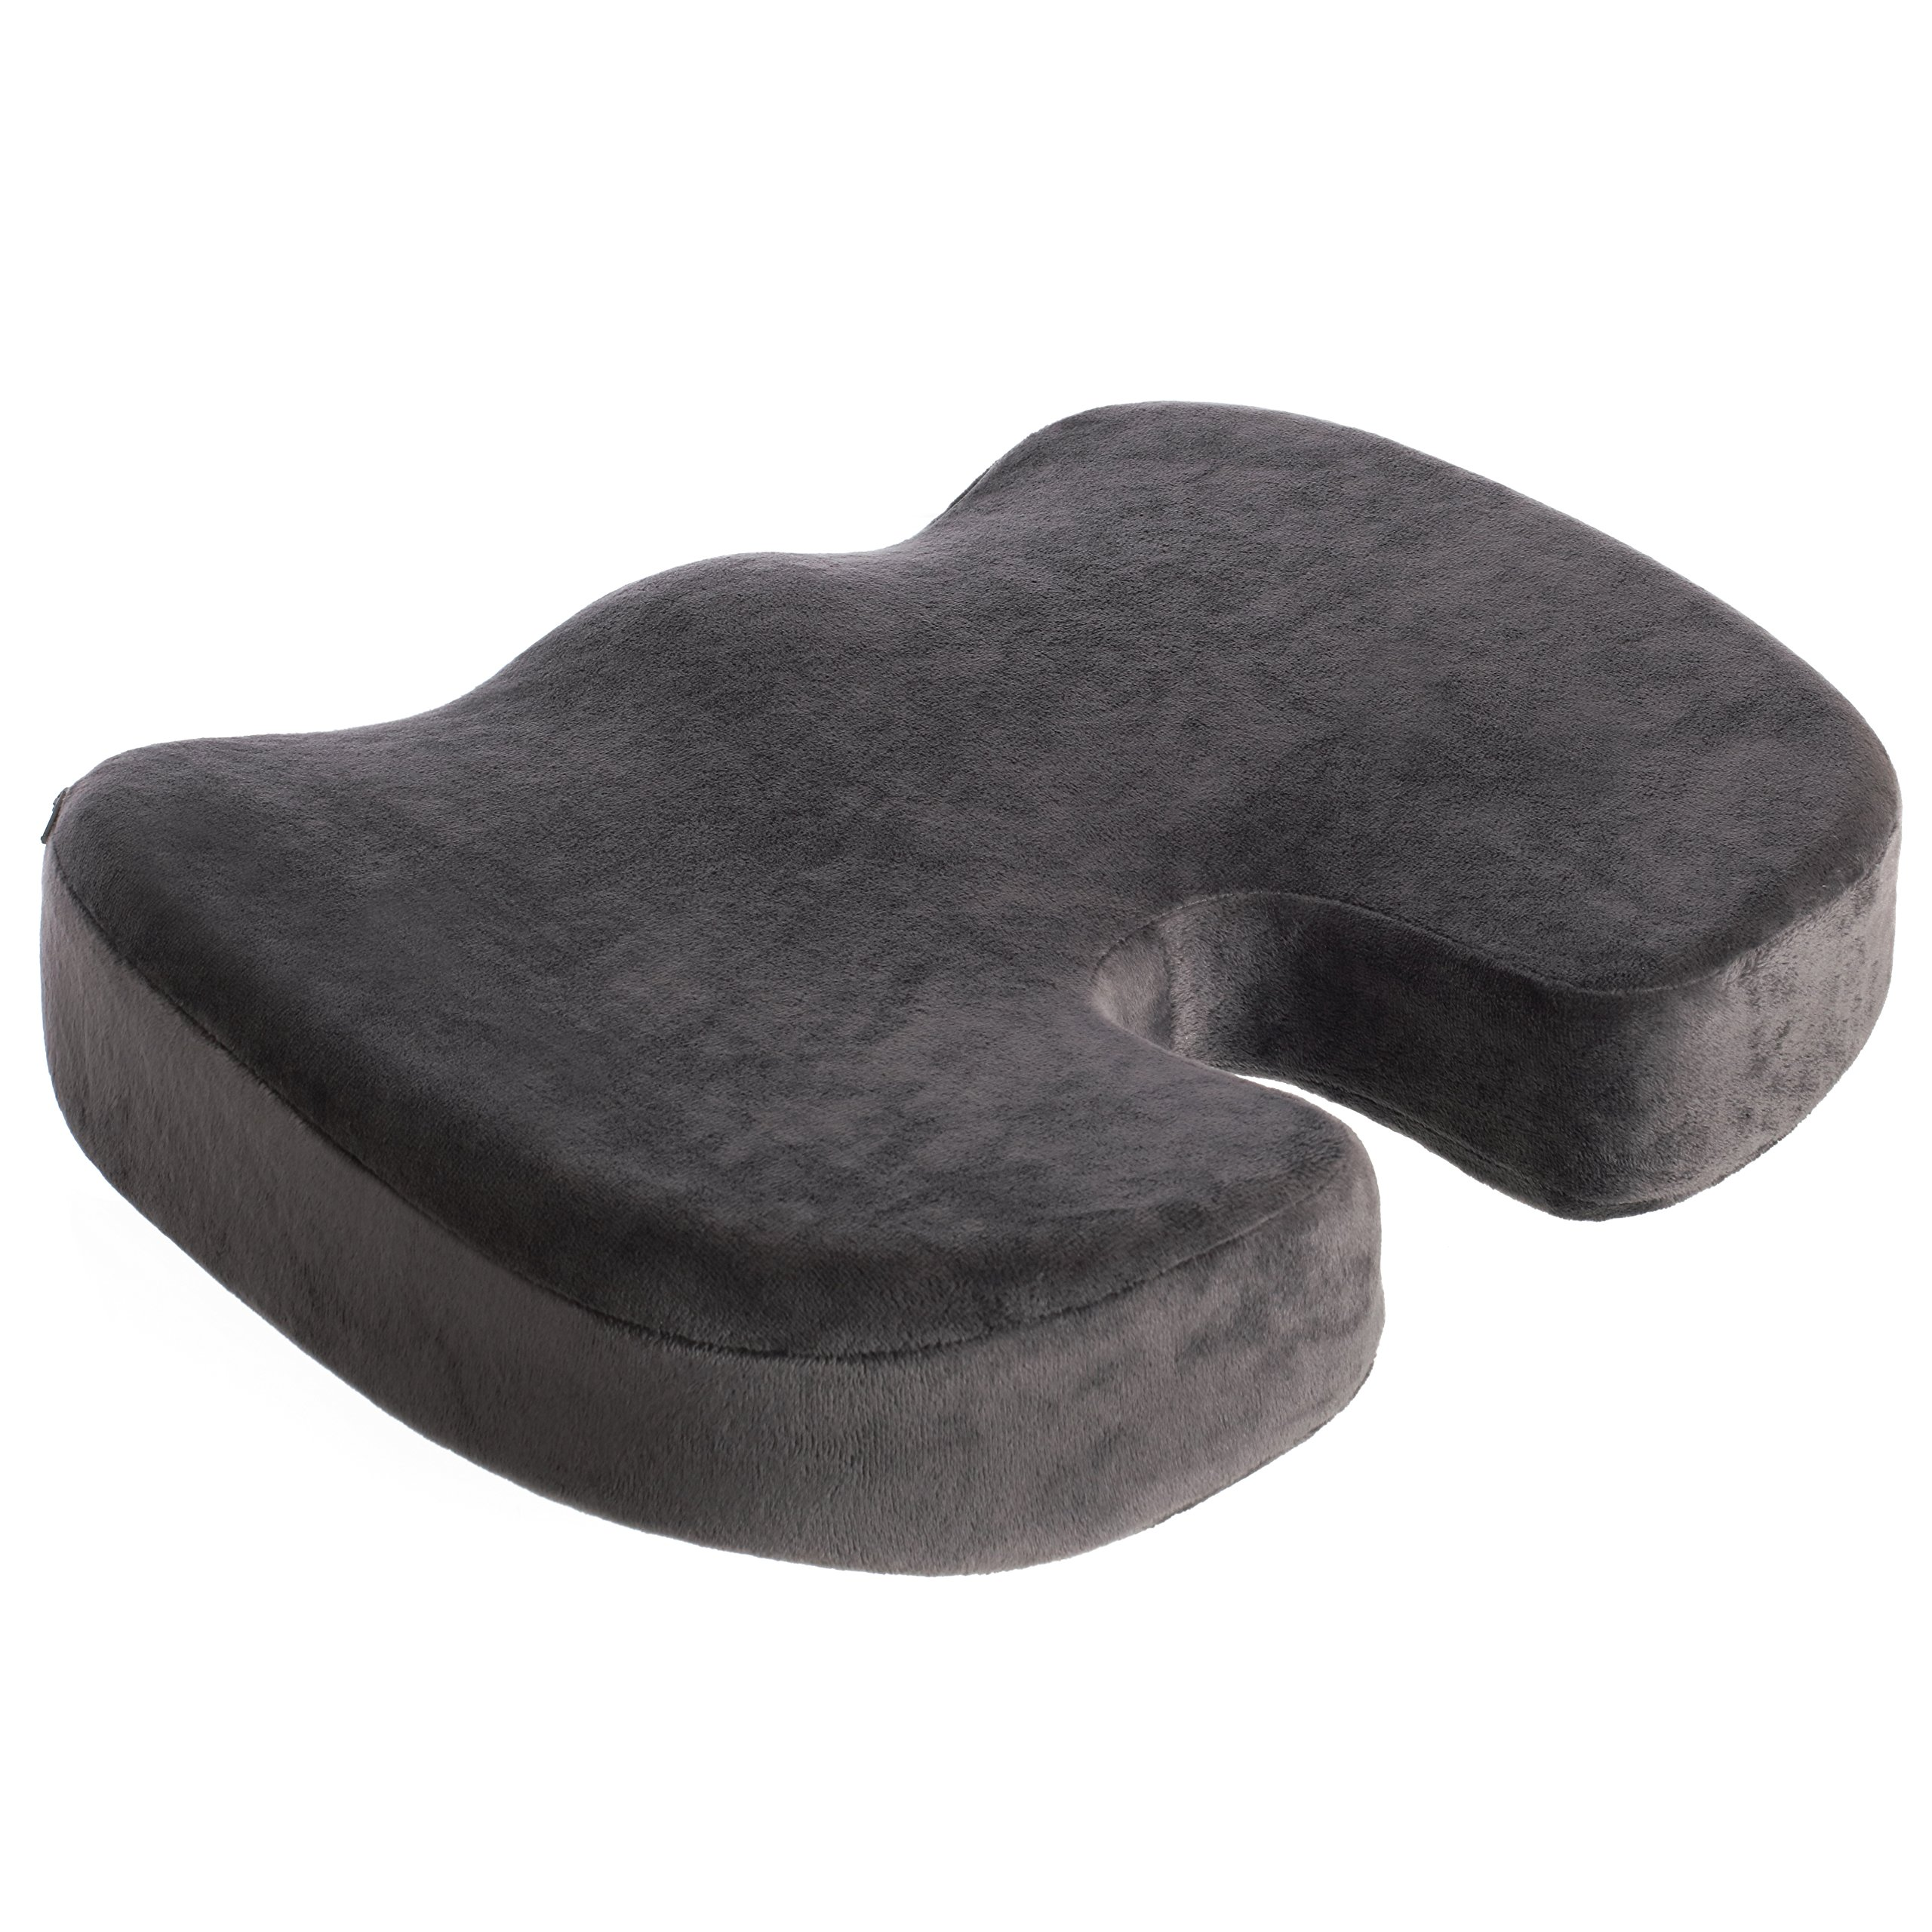 Orthopedic Gel Foam Seat Cushion Pain Relief Pillow Car Driver